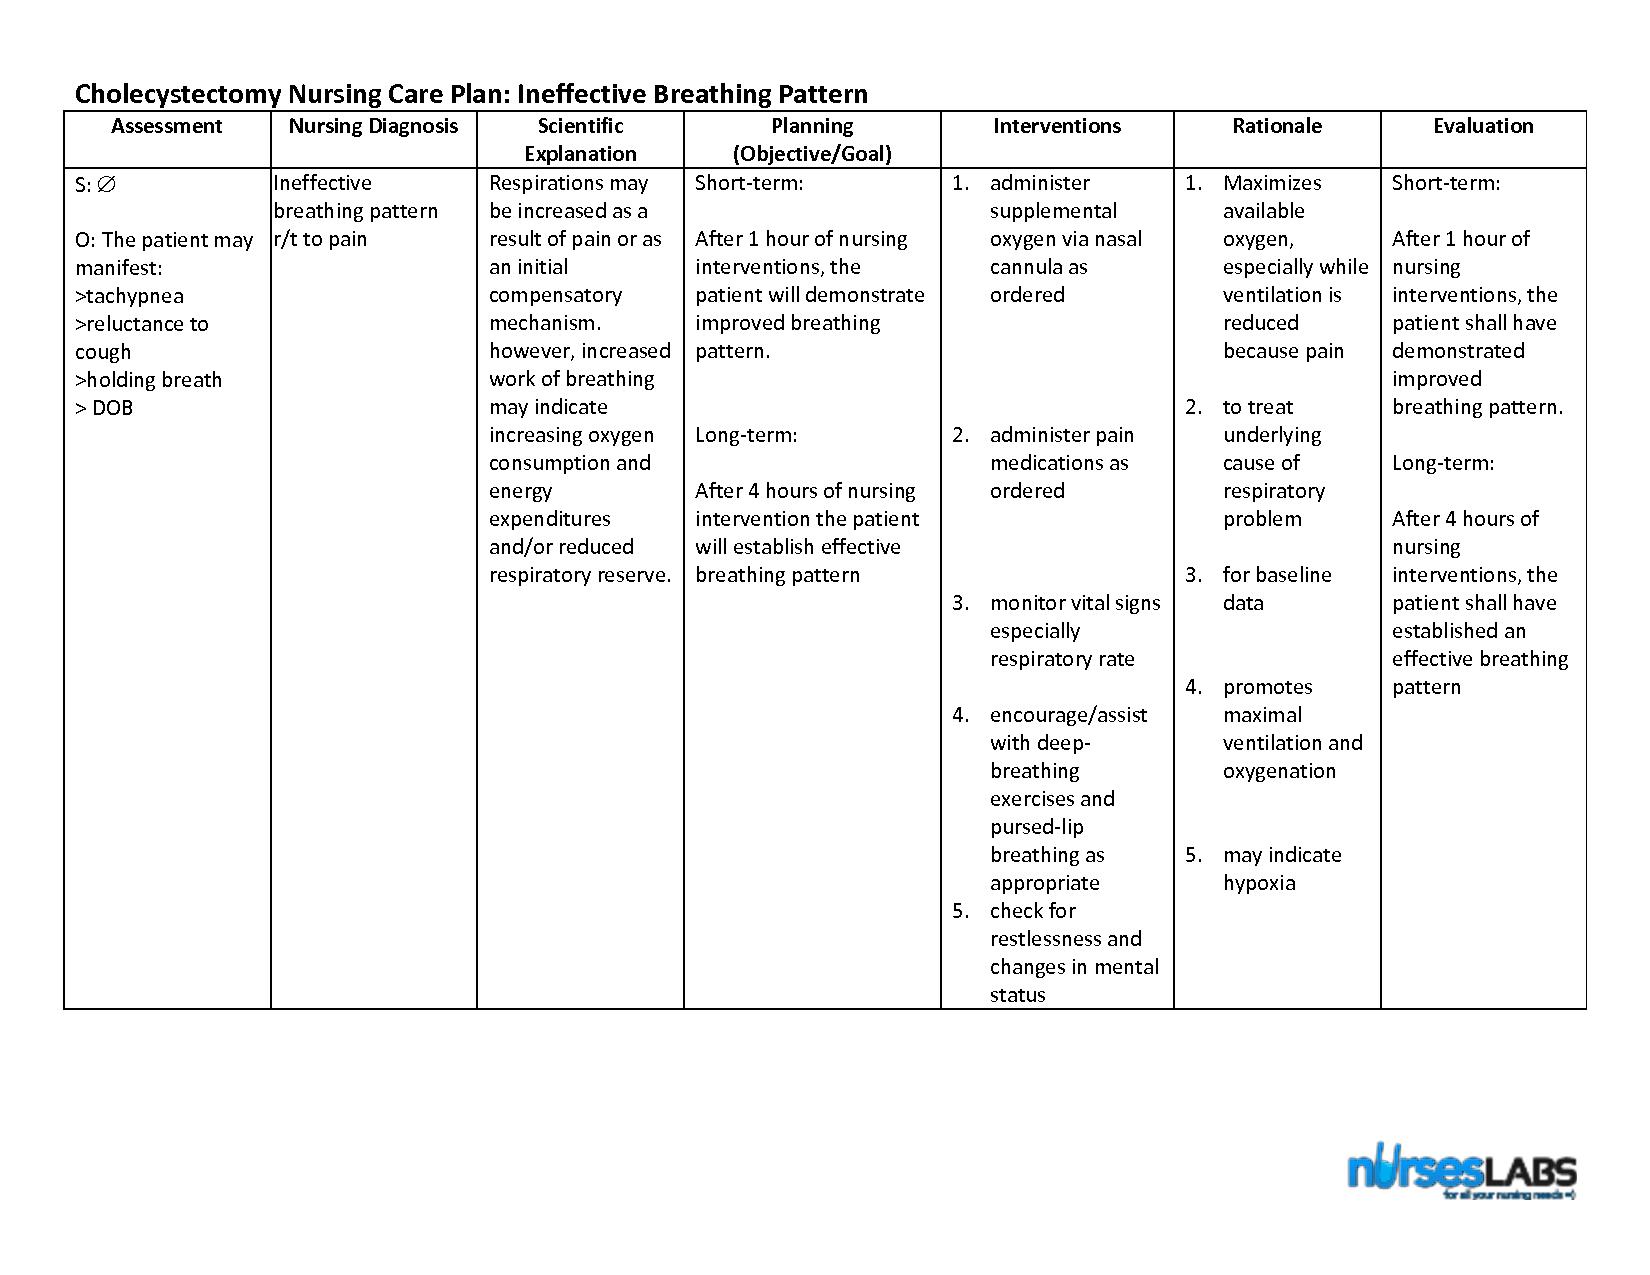 Nanda Nursing Diagnosis Ineffective Airway | MedicineBTG.com